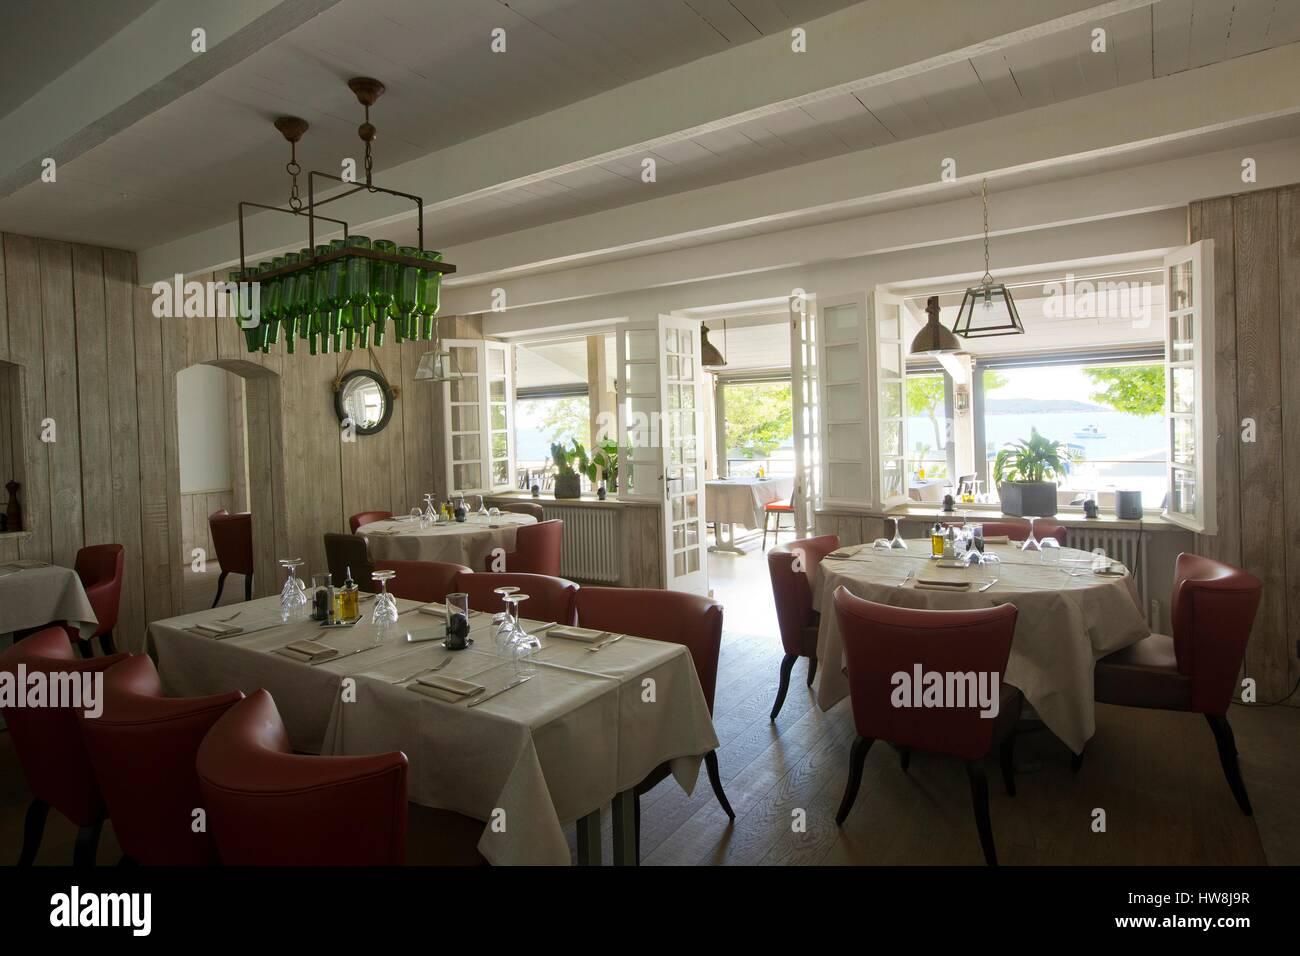 Sud stockfotos sud bilder seite 28 alamy - Restaurant corse du sud ...